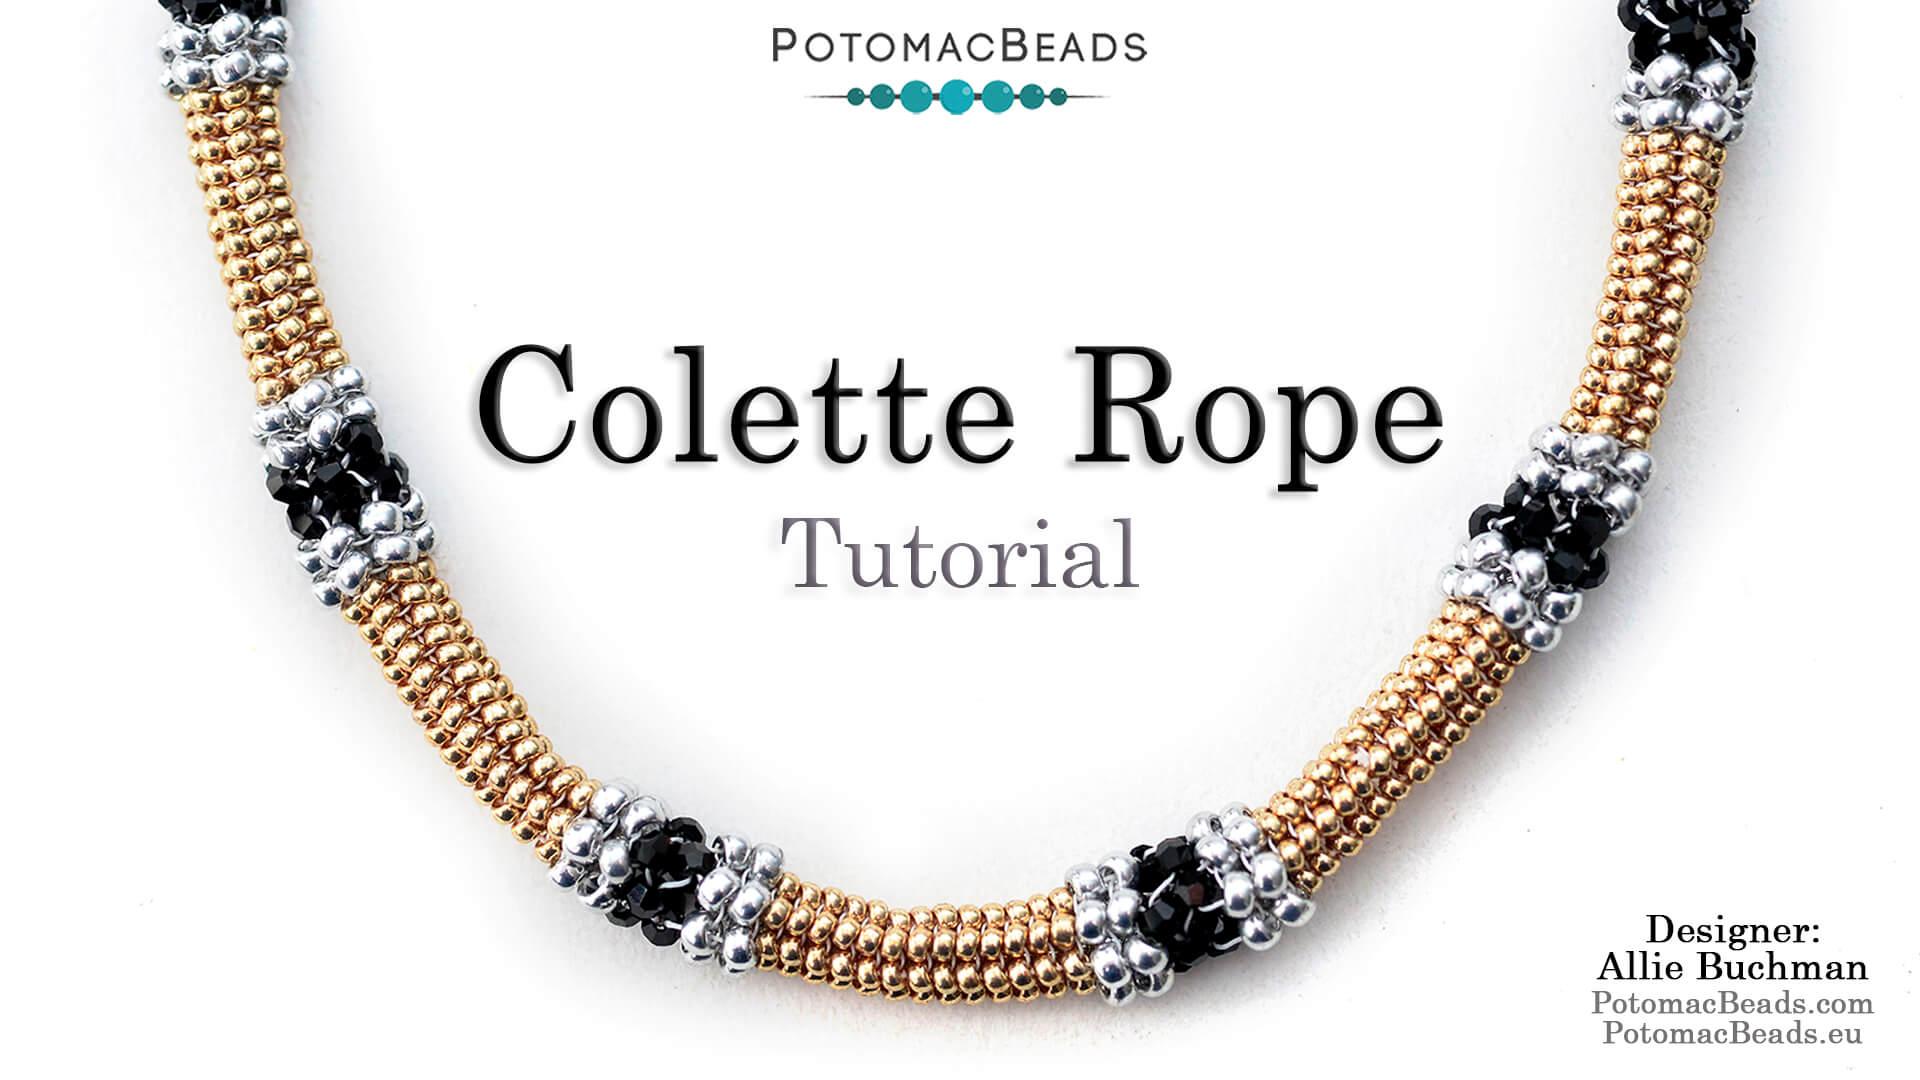 How to Bead Jewelry / Beading Tutorials & Jewel Making Videos / Bead Weaving Tutorials & Necklace Tutorial / Colette Rope Tutorial